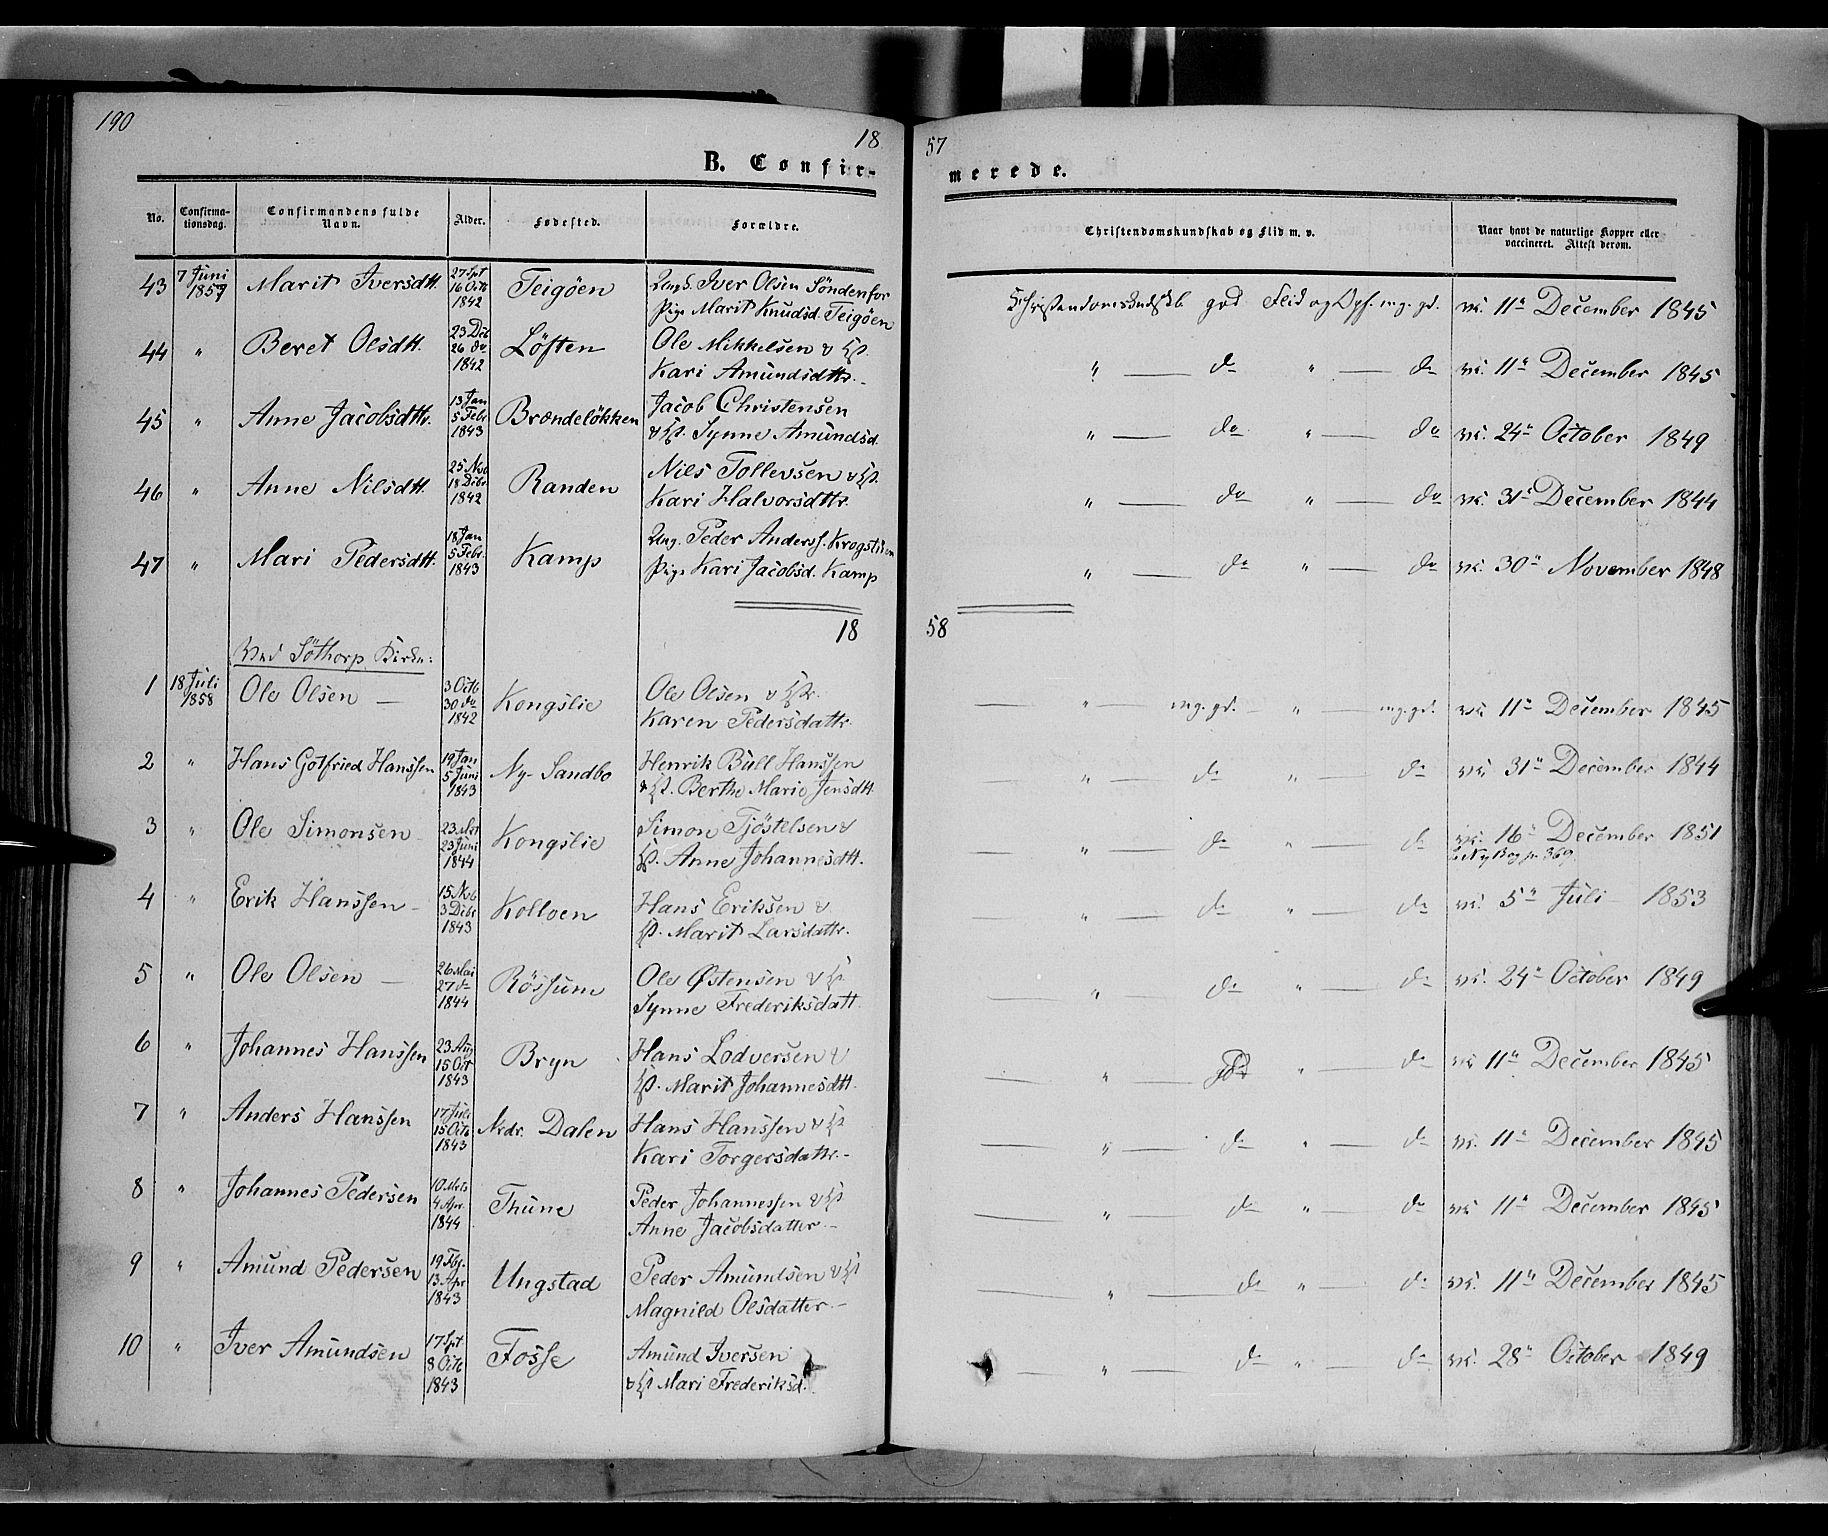 SAH, Nord-Fron prestekontor, Ministerialbok nr. 1, 1851-1864, s. 190